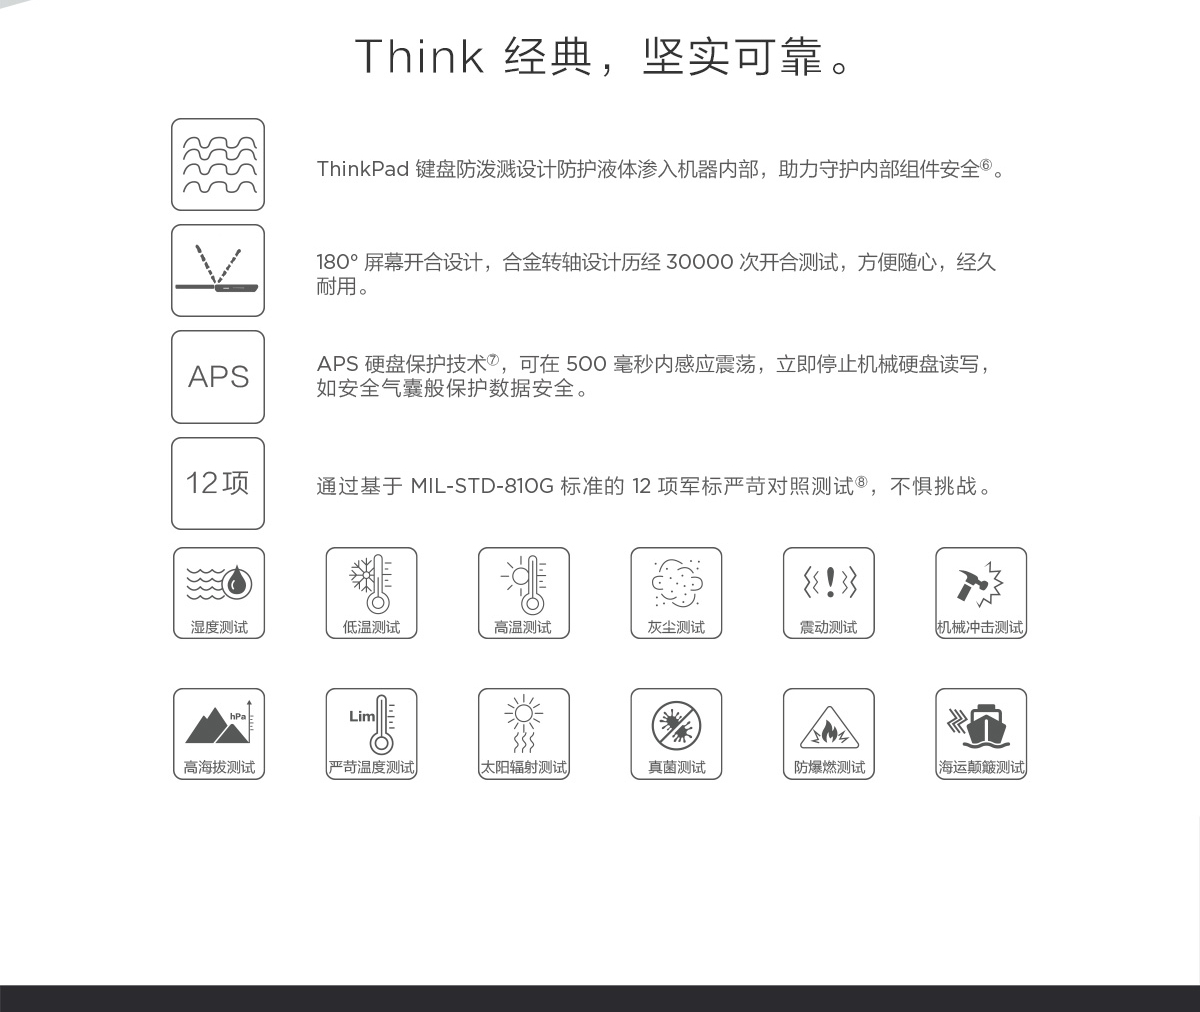 ThinkpadT4800